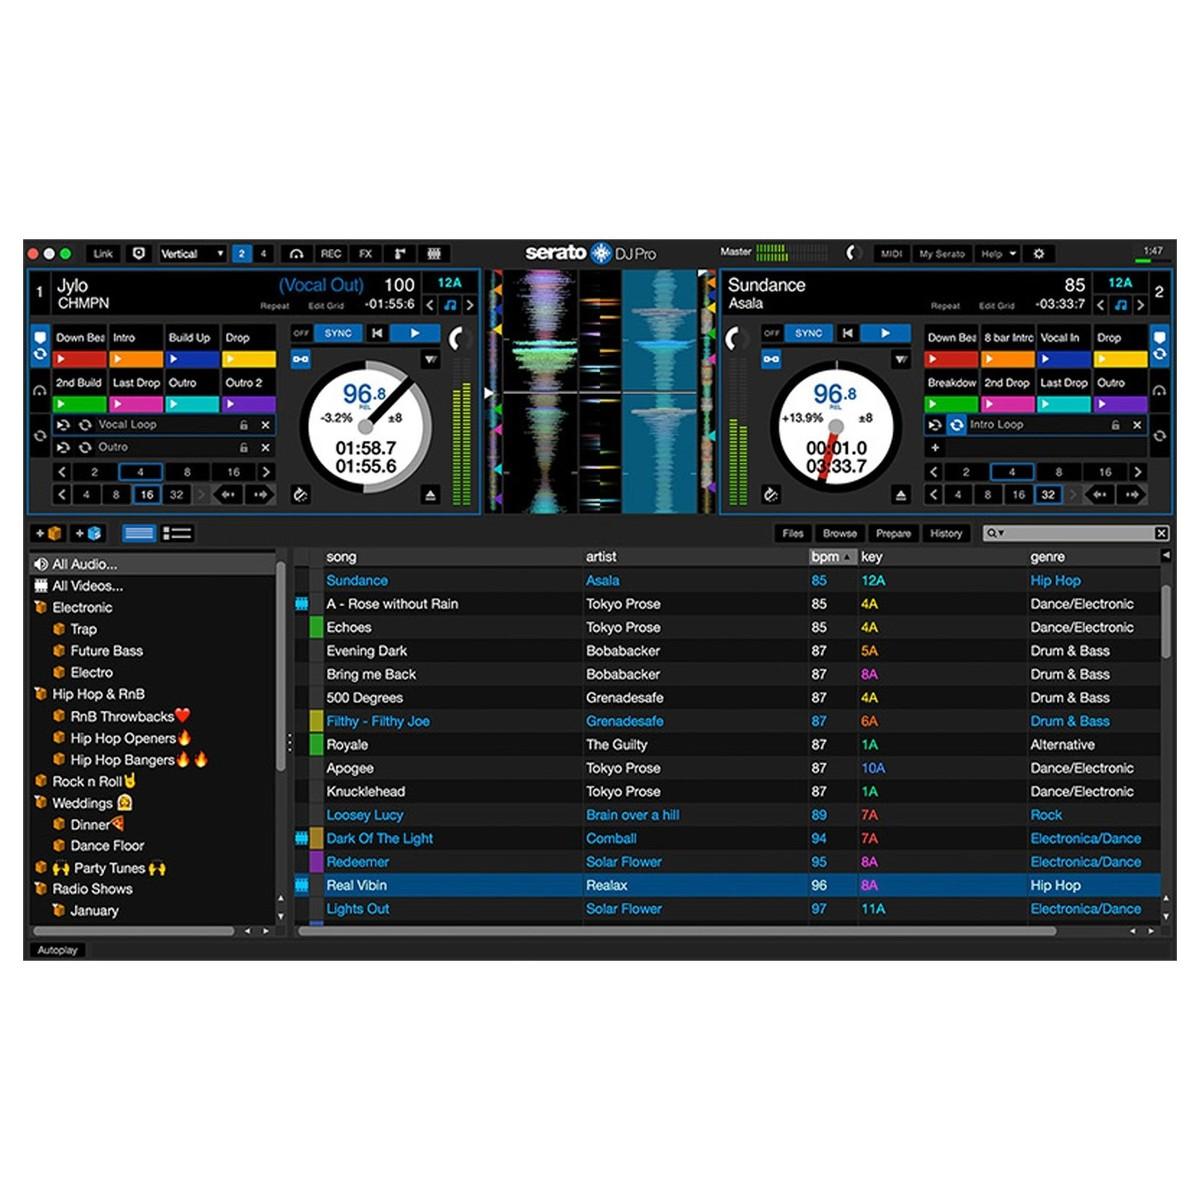 serato dj software free download windows